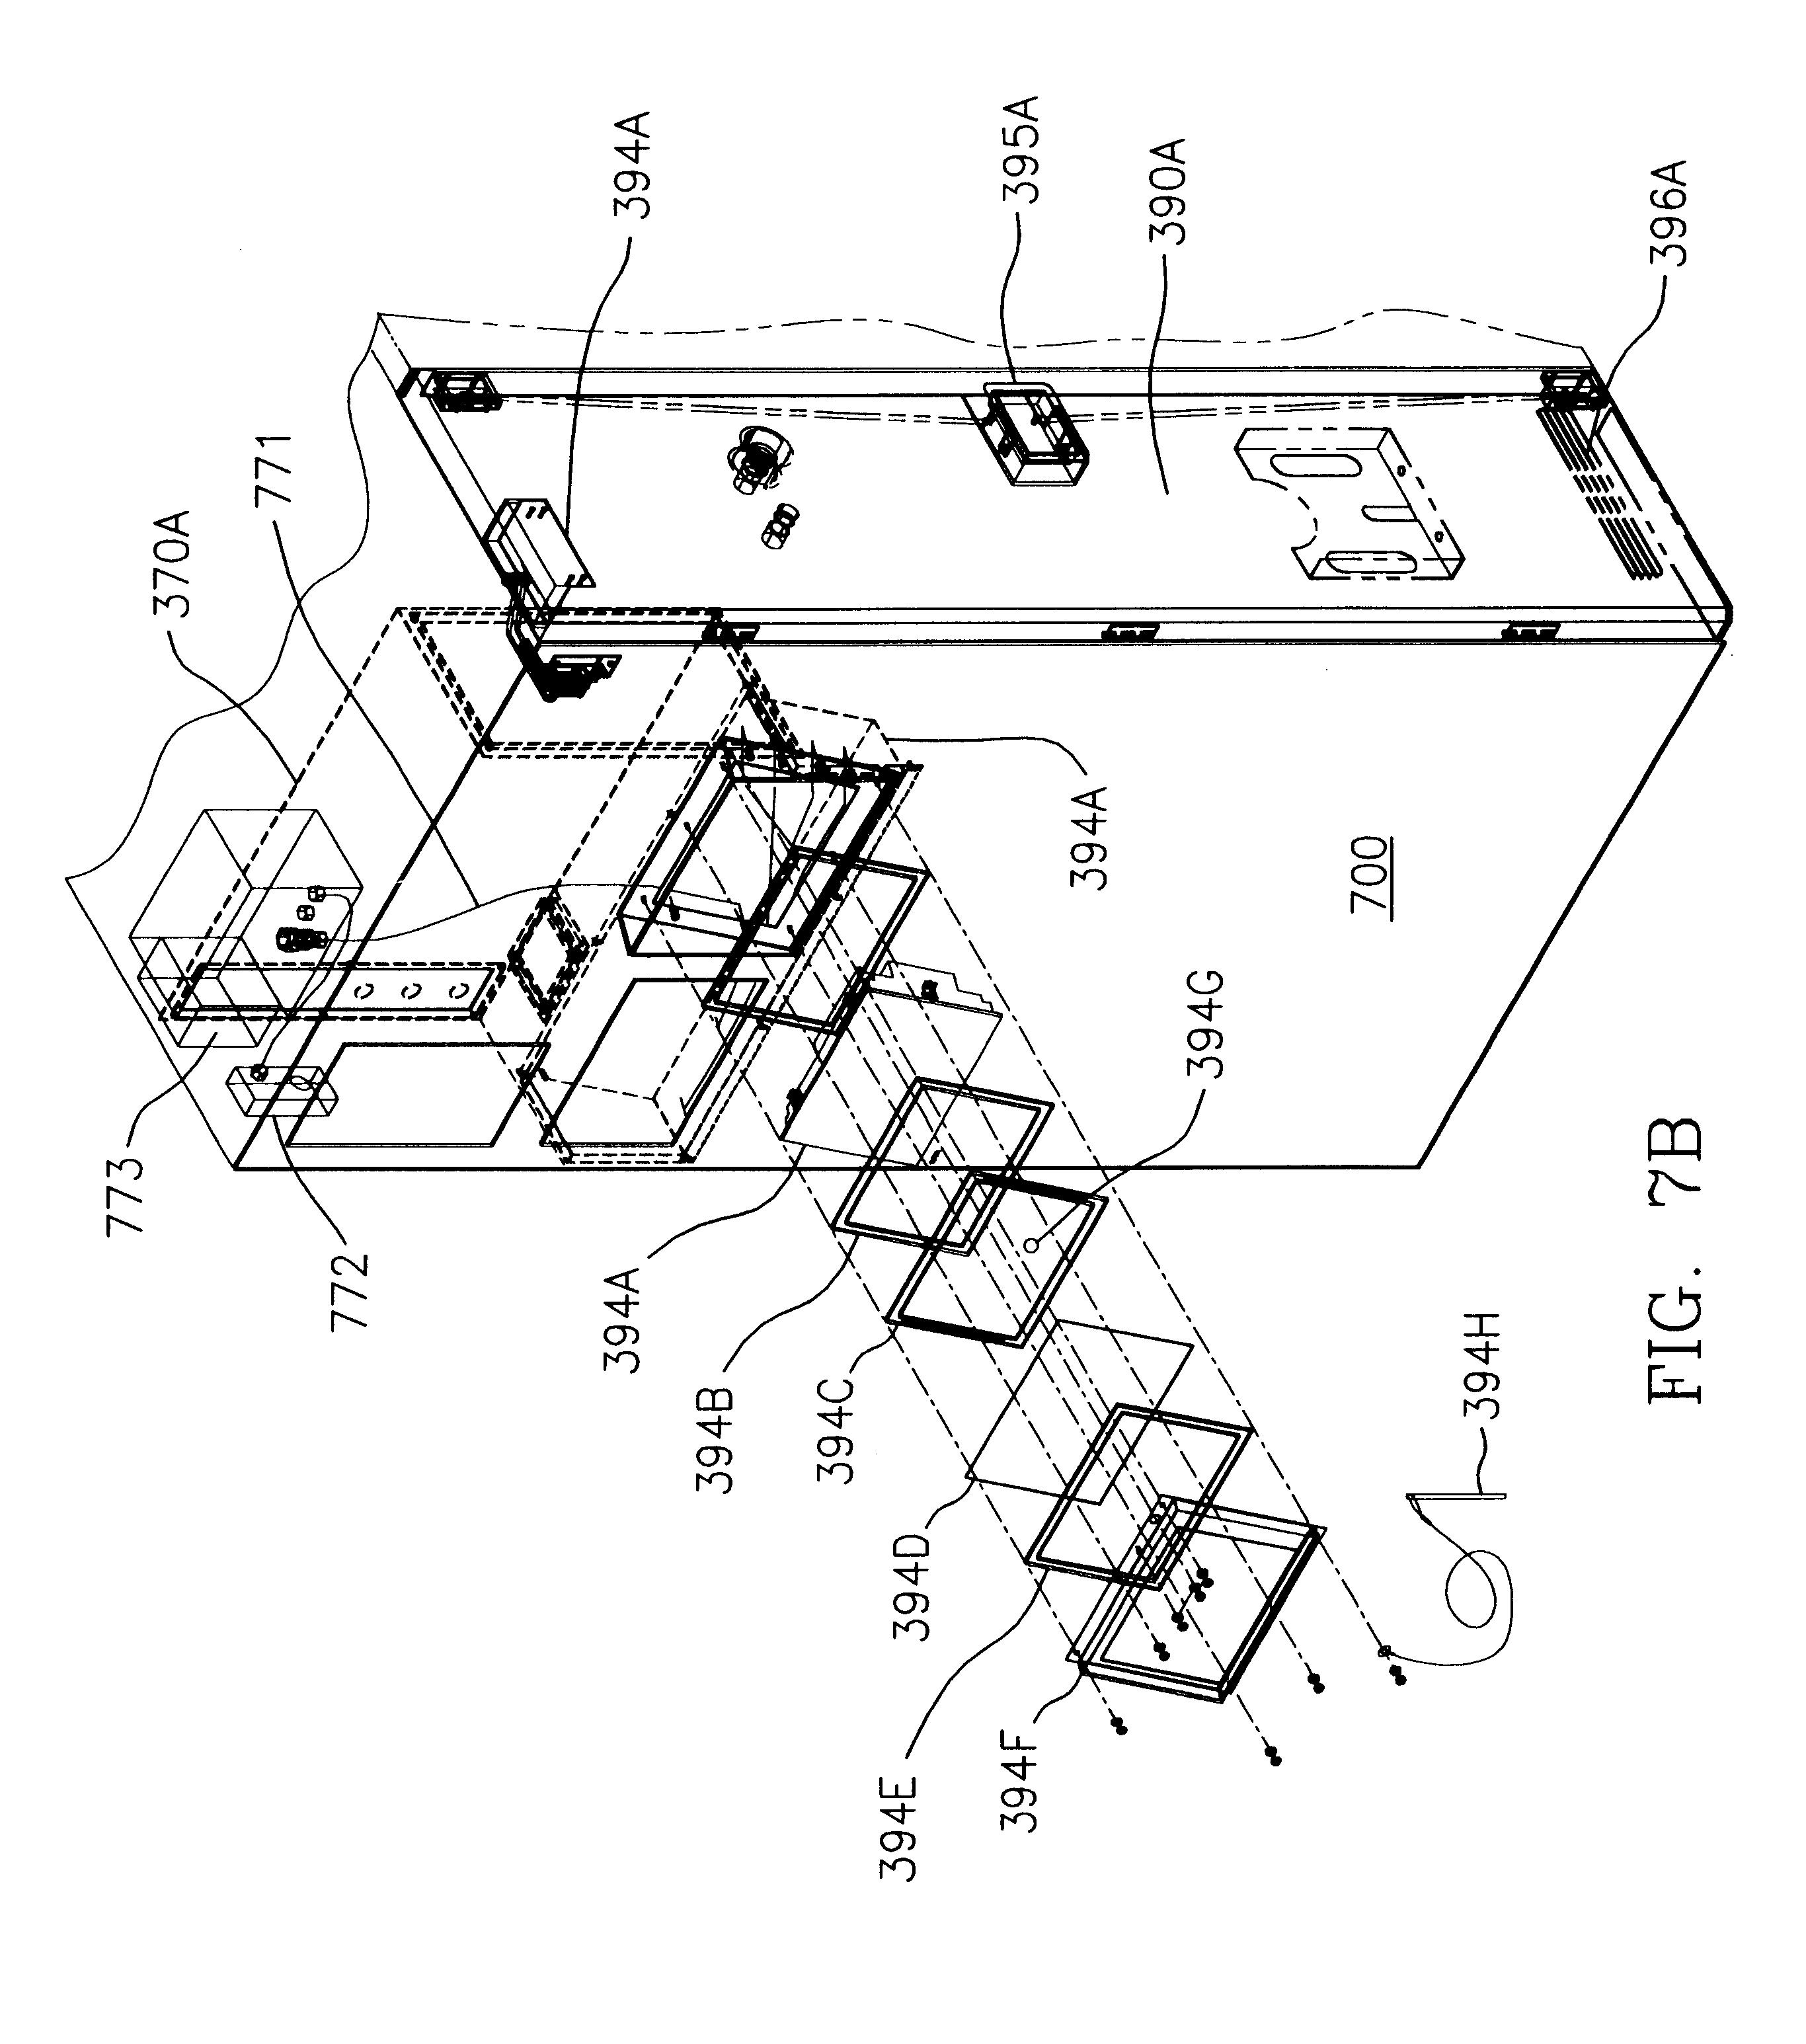 daewoo navigation wiring diagram best wiring library C15 Cat No Start patent drawing